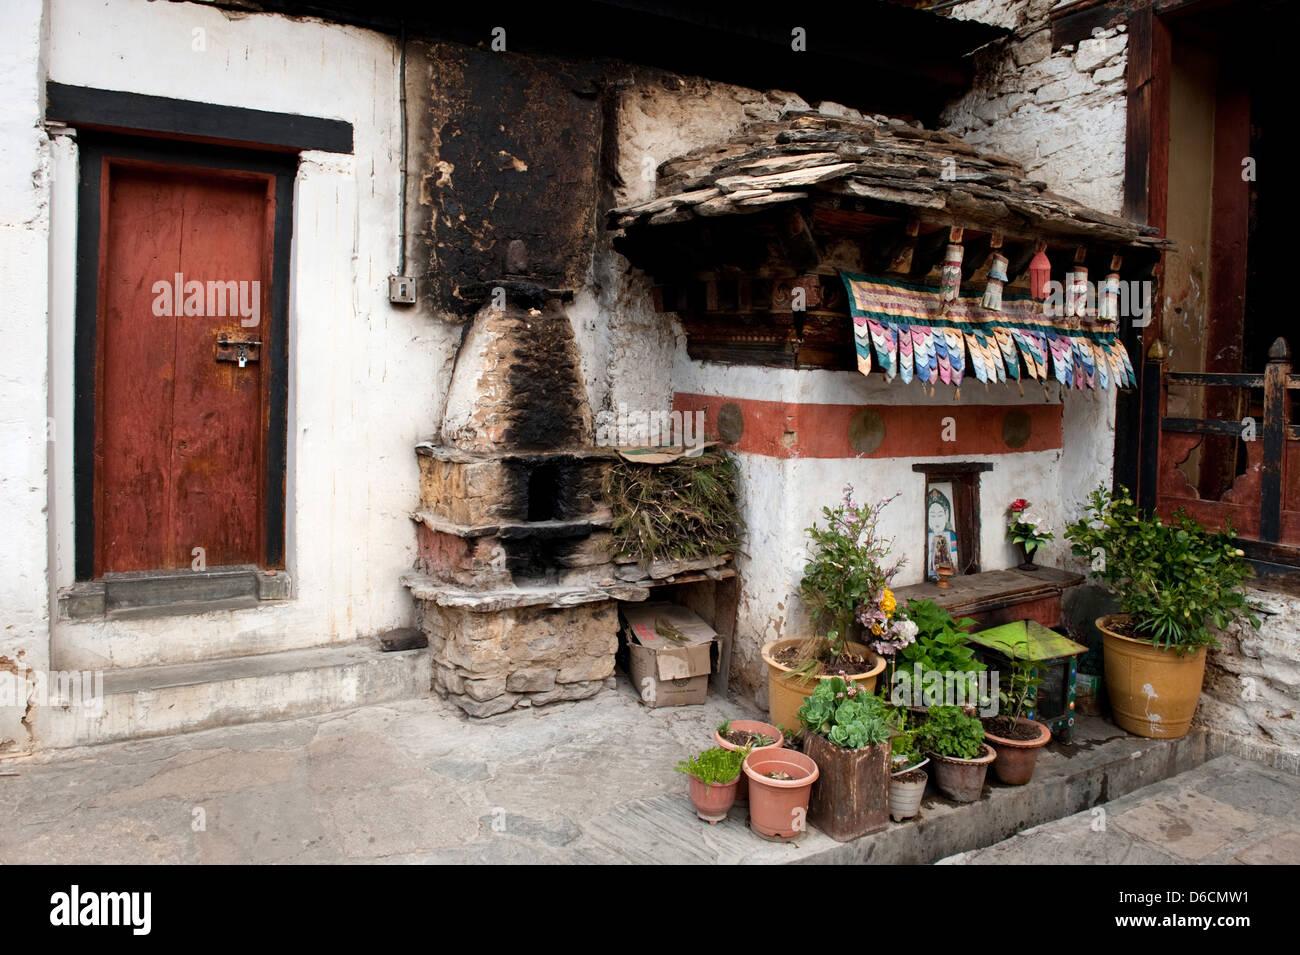 Thimphu, Bhutan, an old stove in Changangkha Lhakhang temple - Stock Image